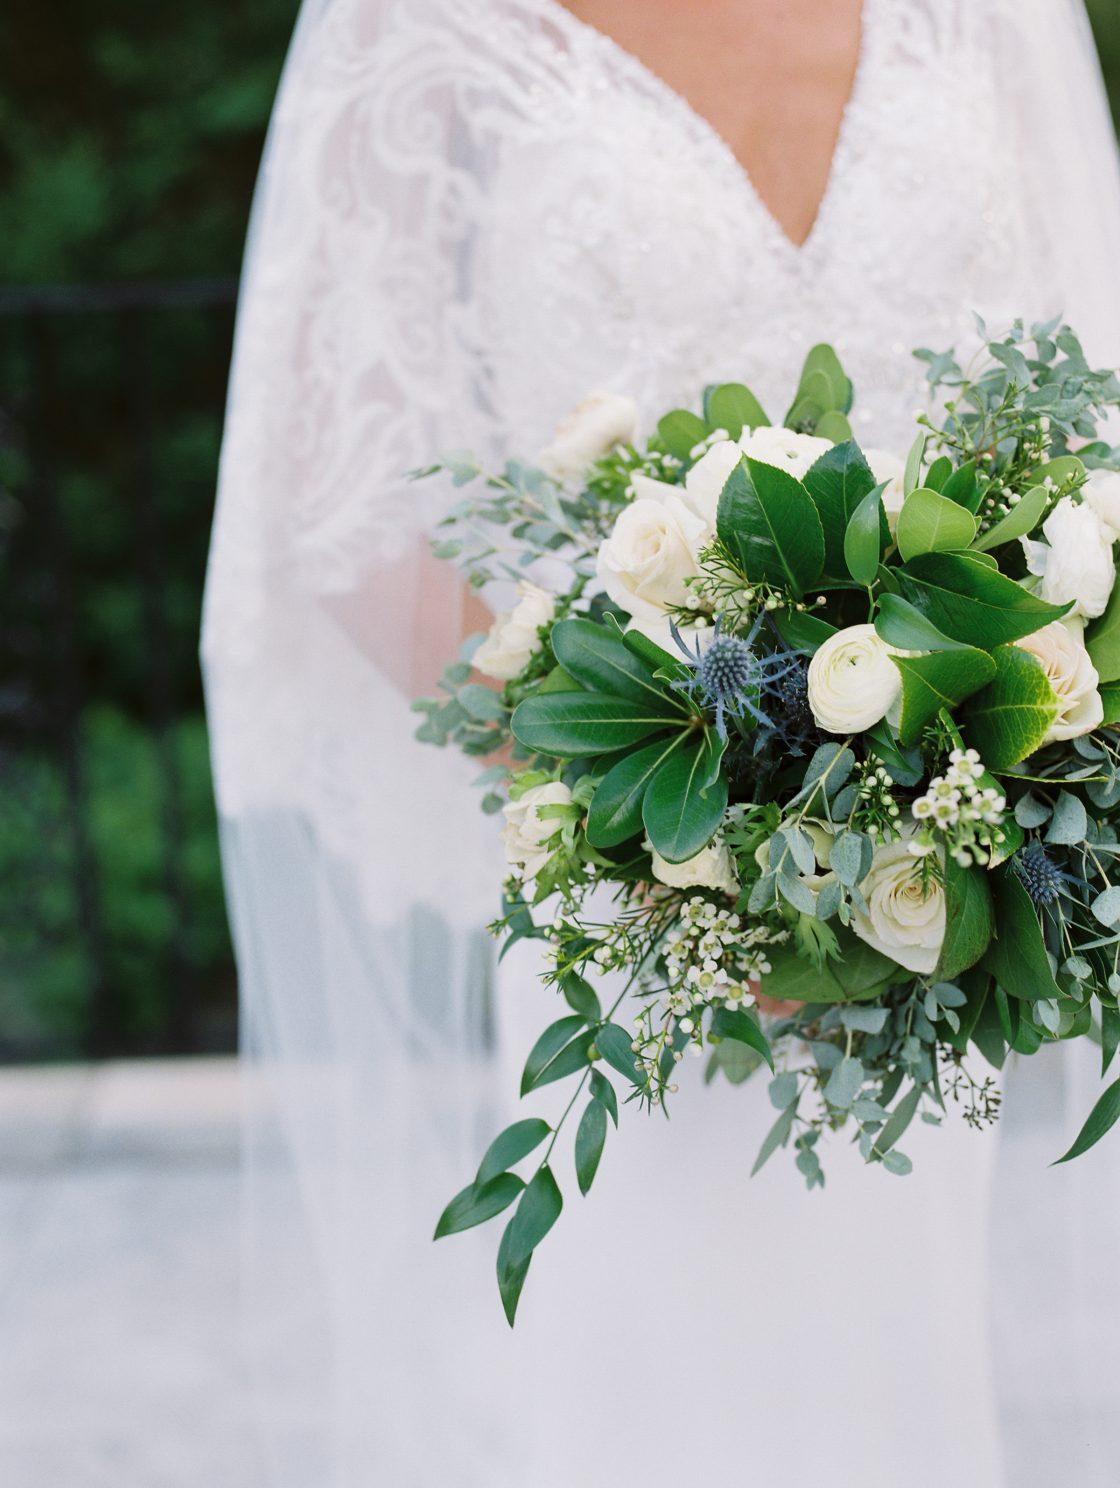 Elegant New Jersey Wedding with Greenery 61